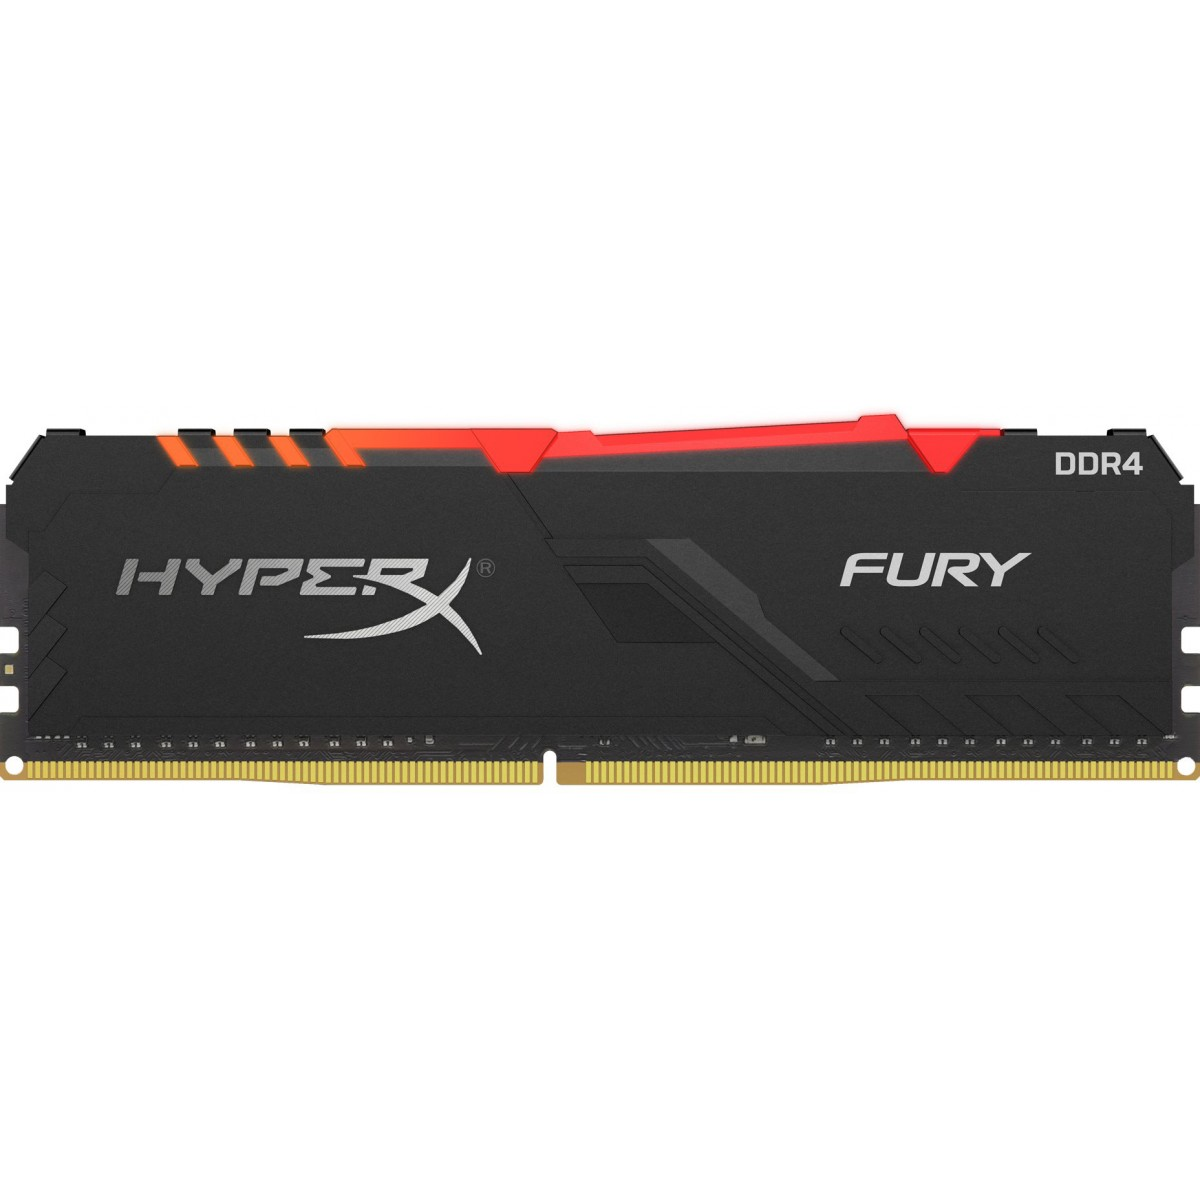 Memória DDR4 Kingston HyperX Fury RGB, 8GB 2666MHz, Black, HX426C16FB3A/8